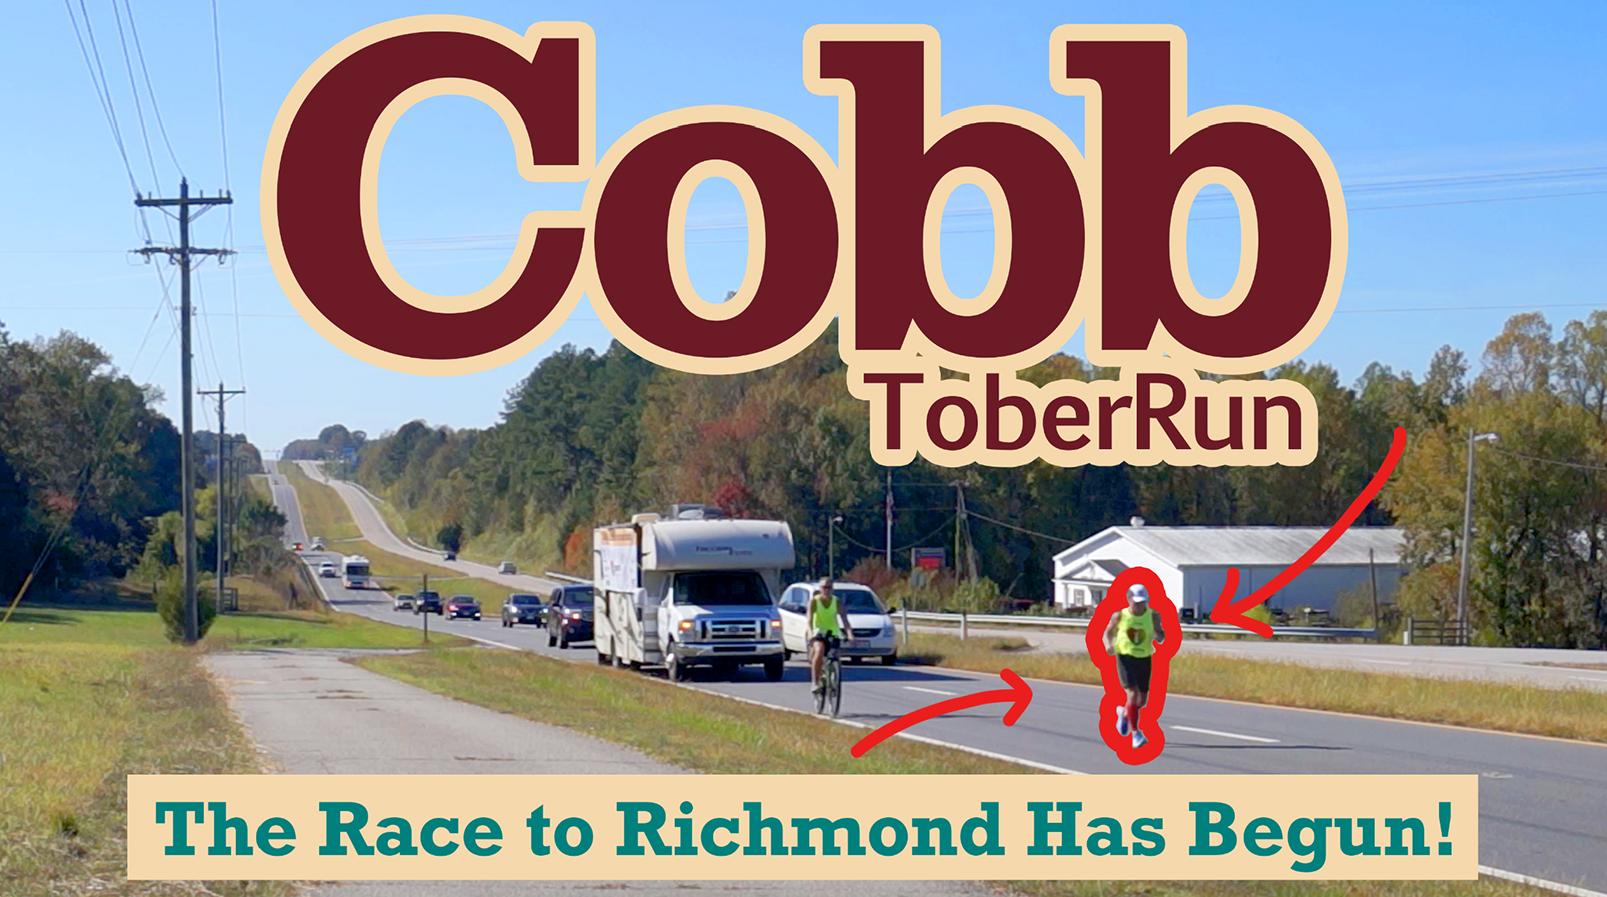 CobbtoberRun - The Race to Richmond Has Begun